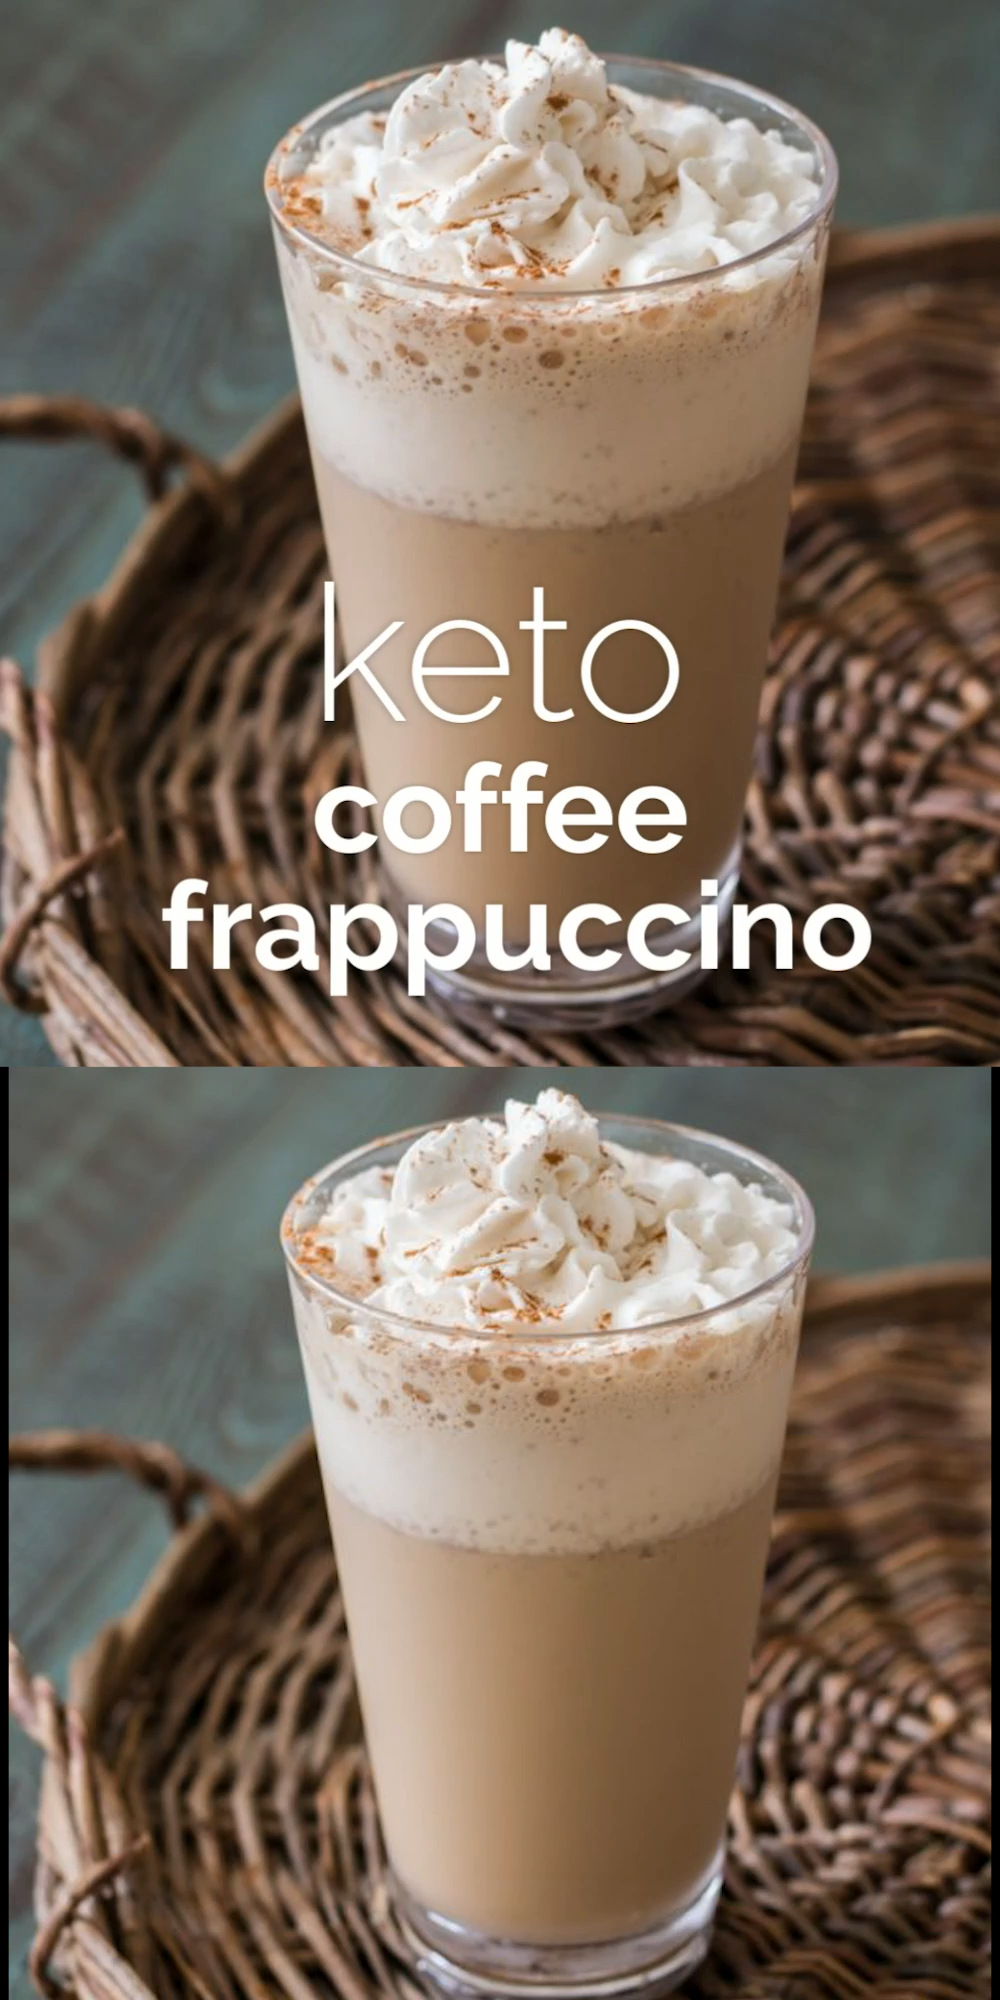 Keto Coffee Frappuccino (2 net carbs!)